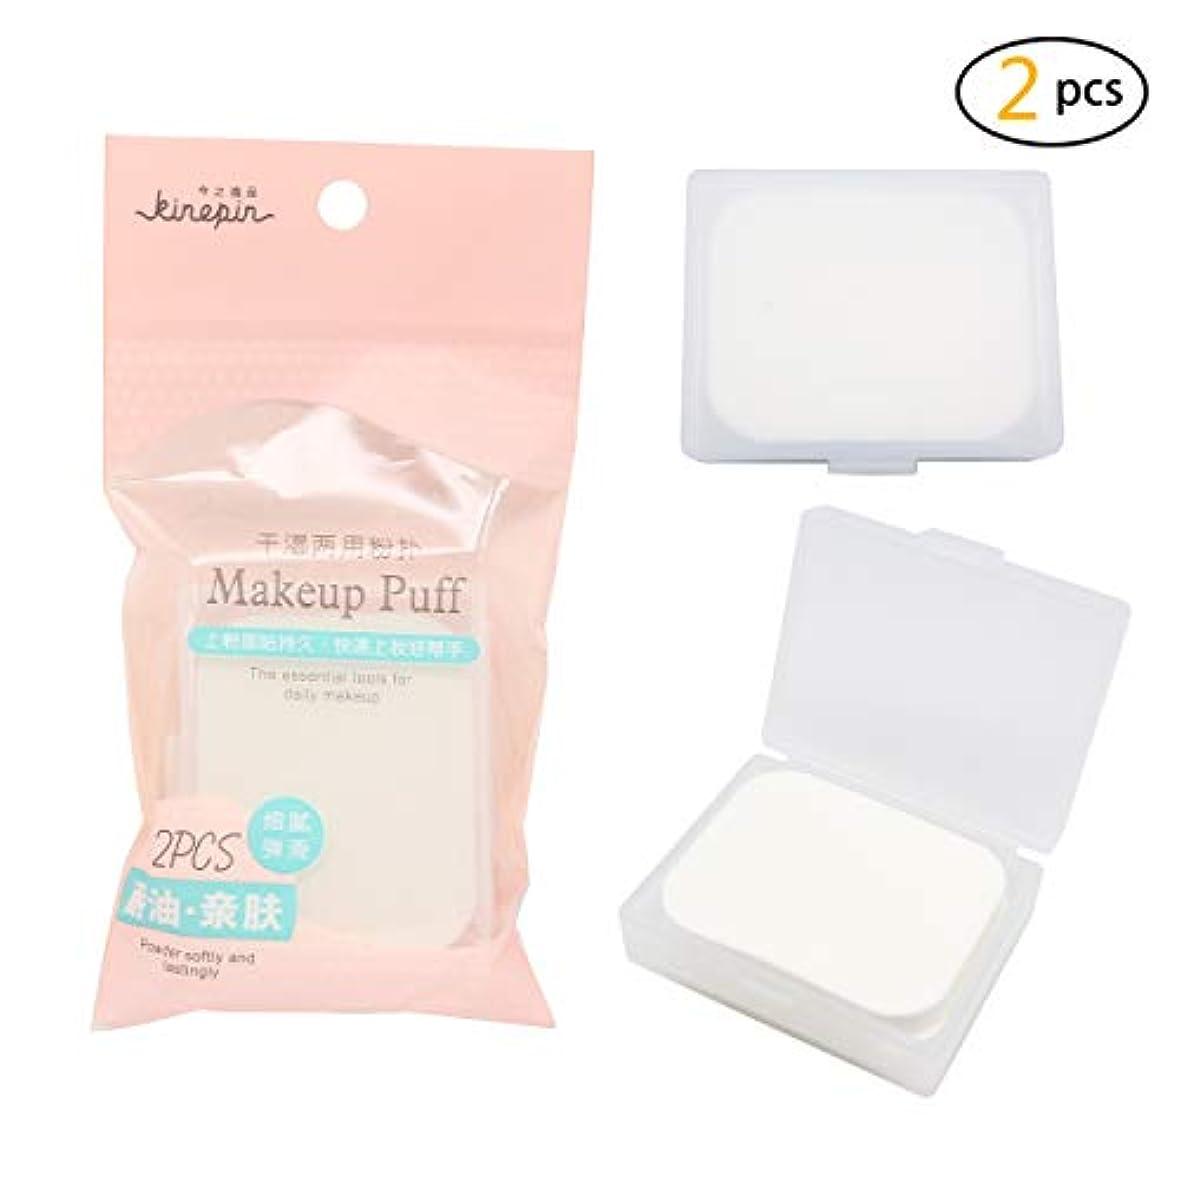 Dofash 2個スクエアメイクアップスポンジ(トラベルケース1枚付き)、コンパクトパウダーパフ、ブレンダースポンジ交換用化粧品完璧なファンデーション(ホワイト)敏感肌用